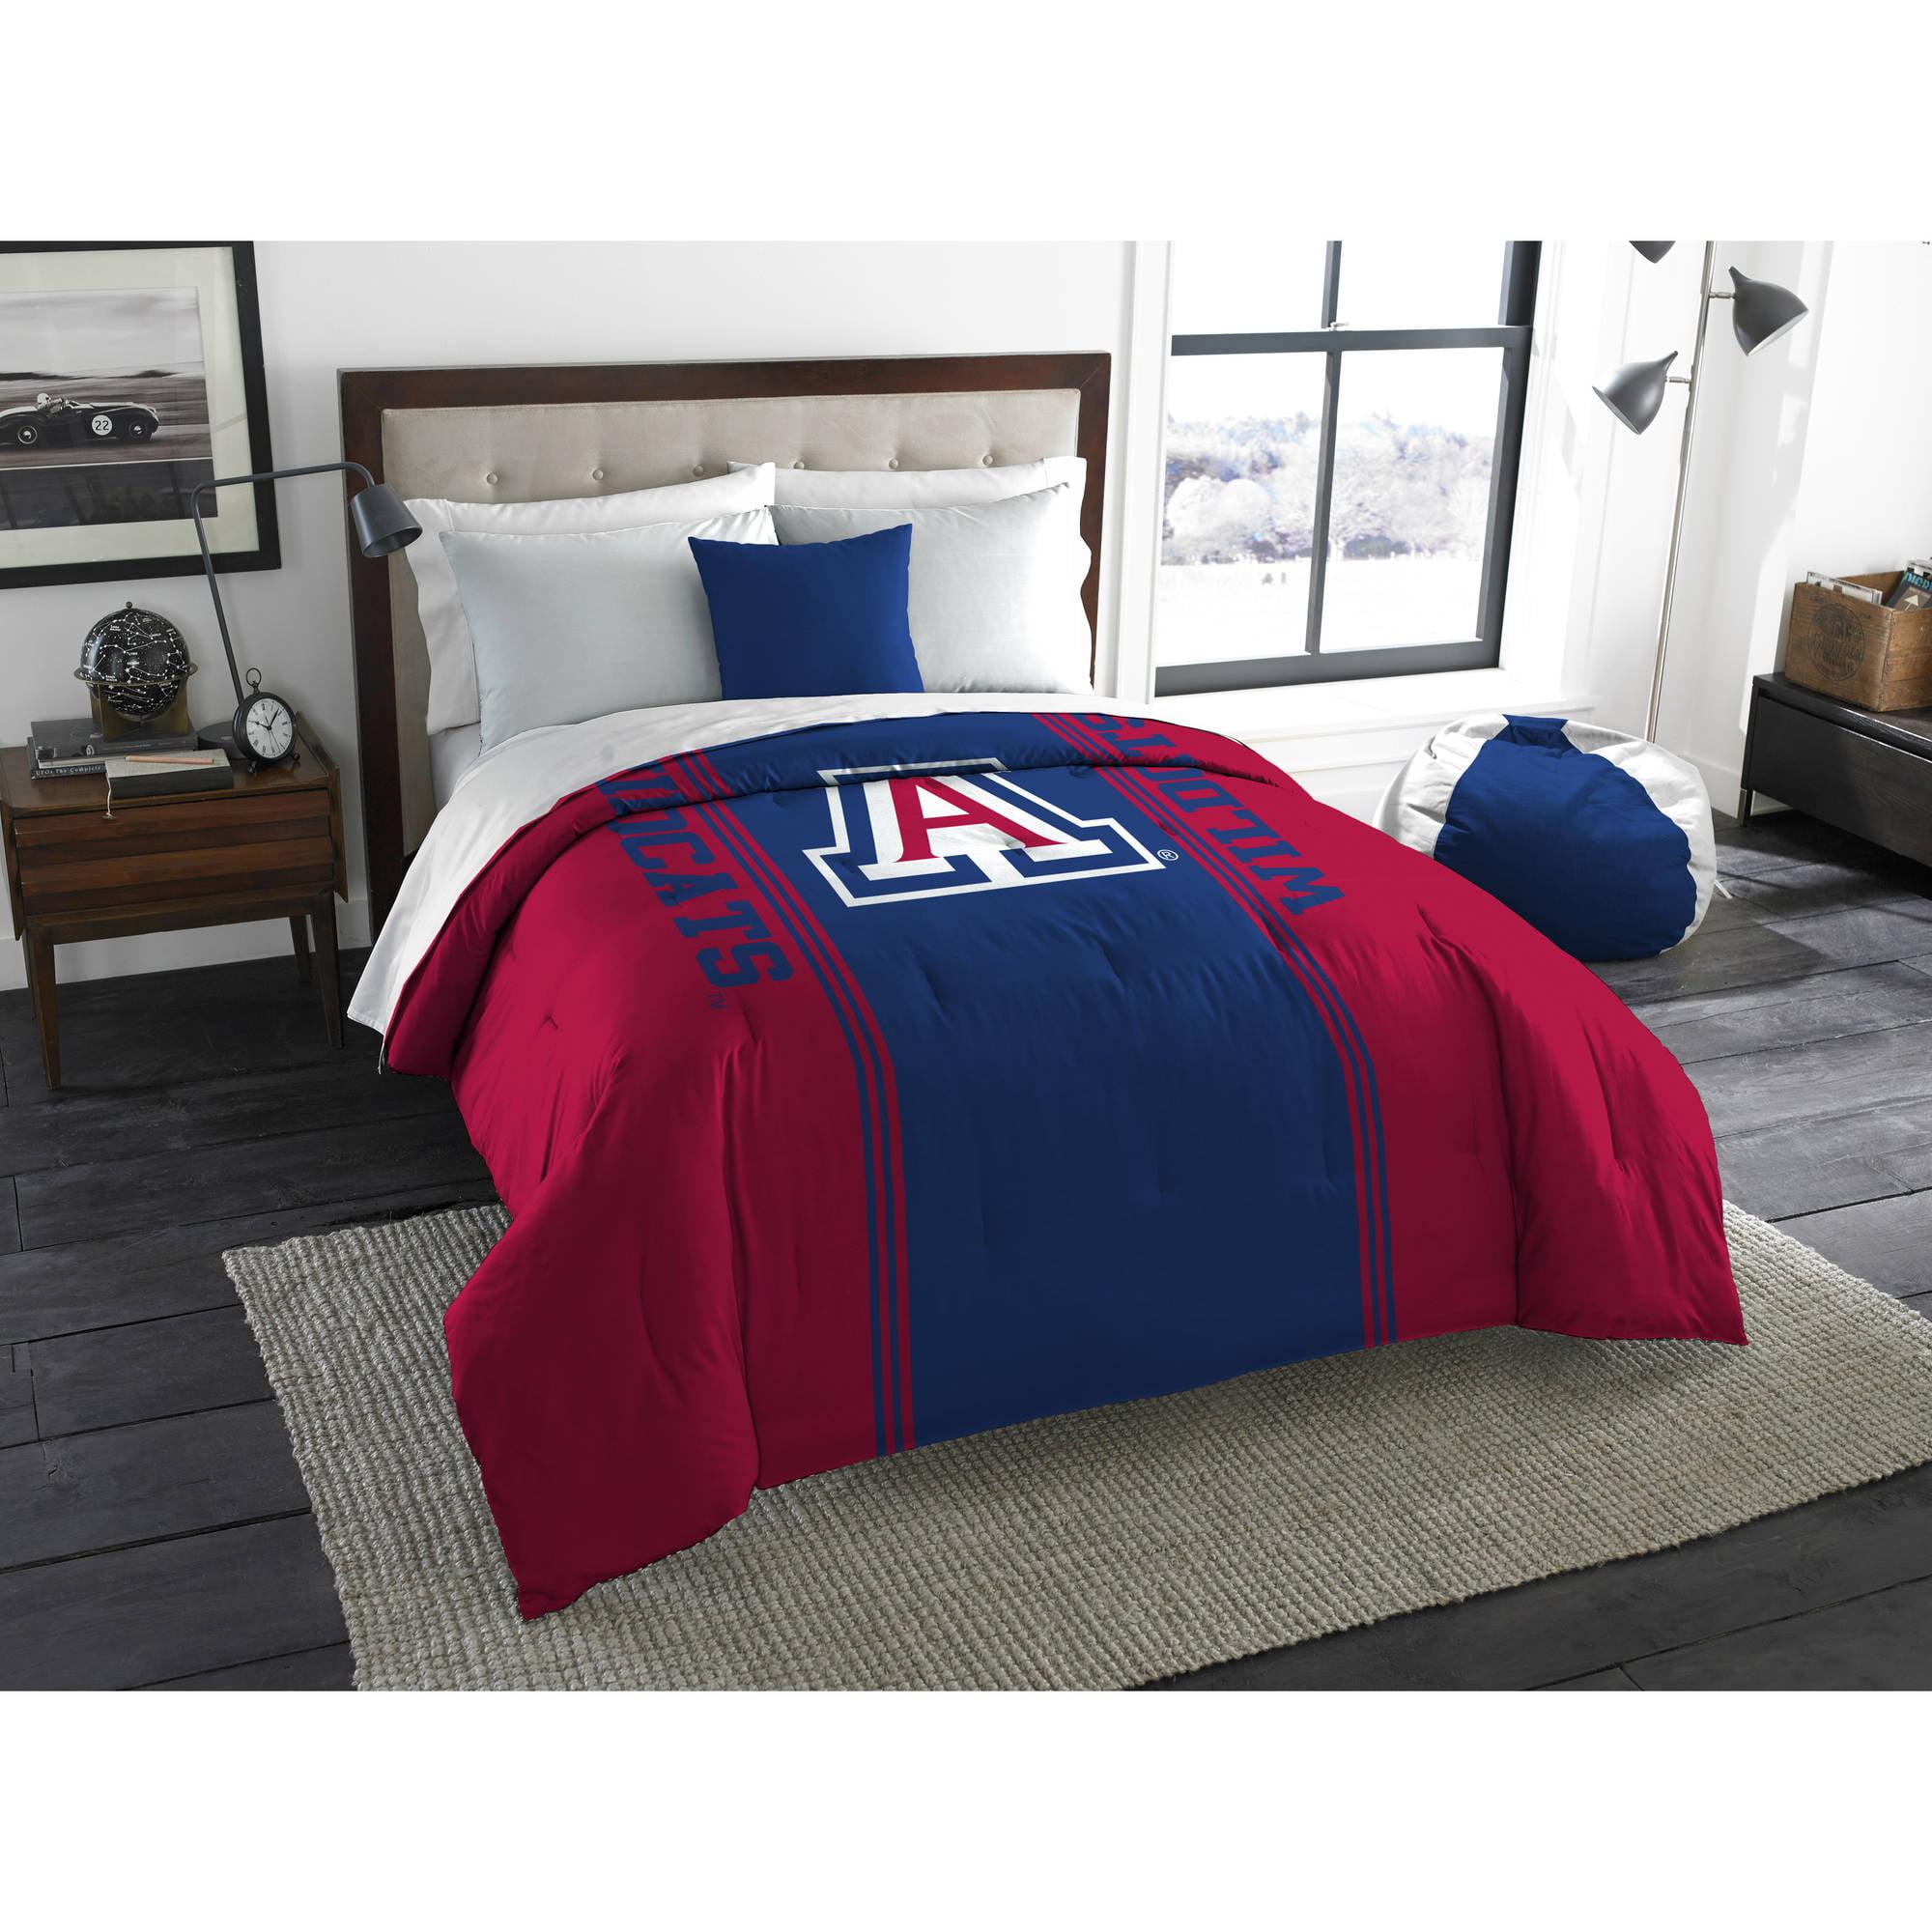 "NCAA Arizona Wildcats ""Mascot"" Twin or Full Bedding Comforter, 1 Each"